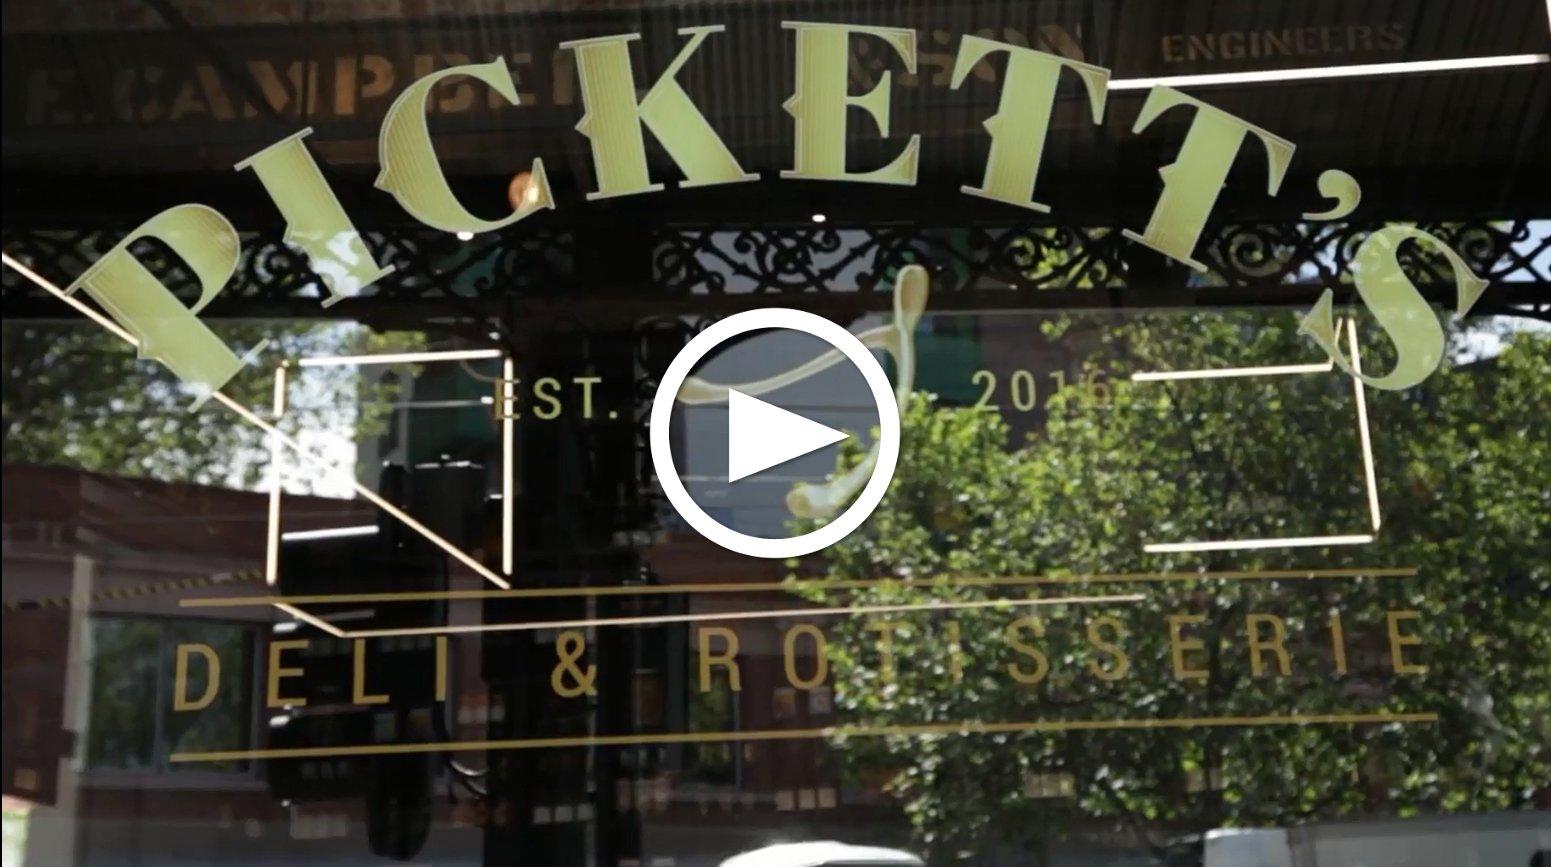 Picketts Deli & Rotisserie